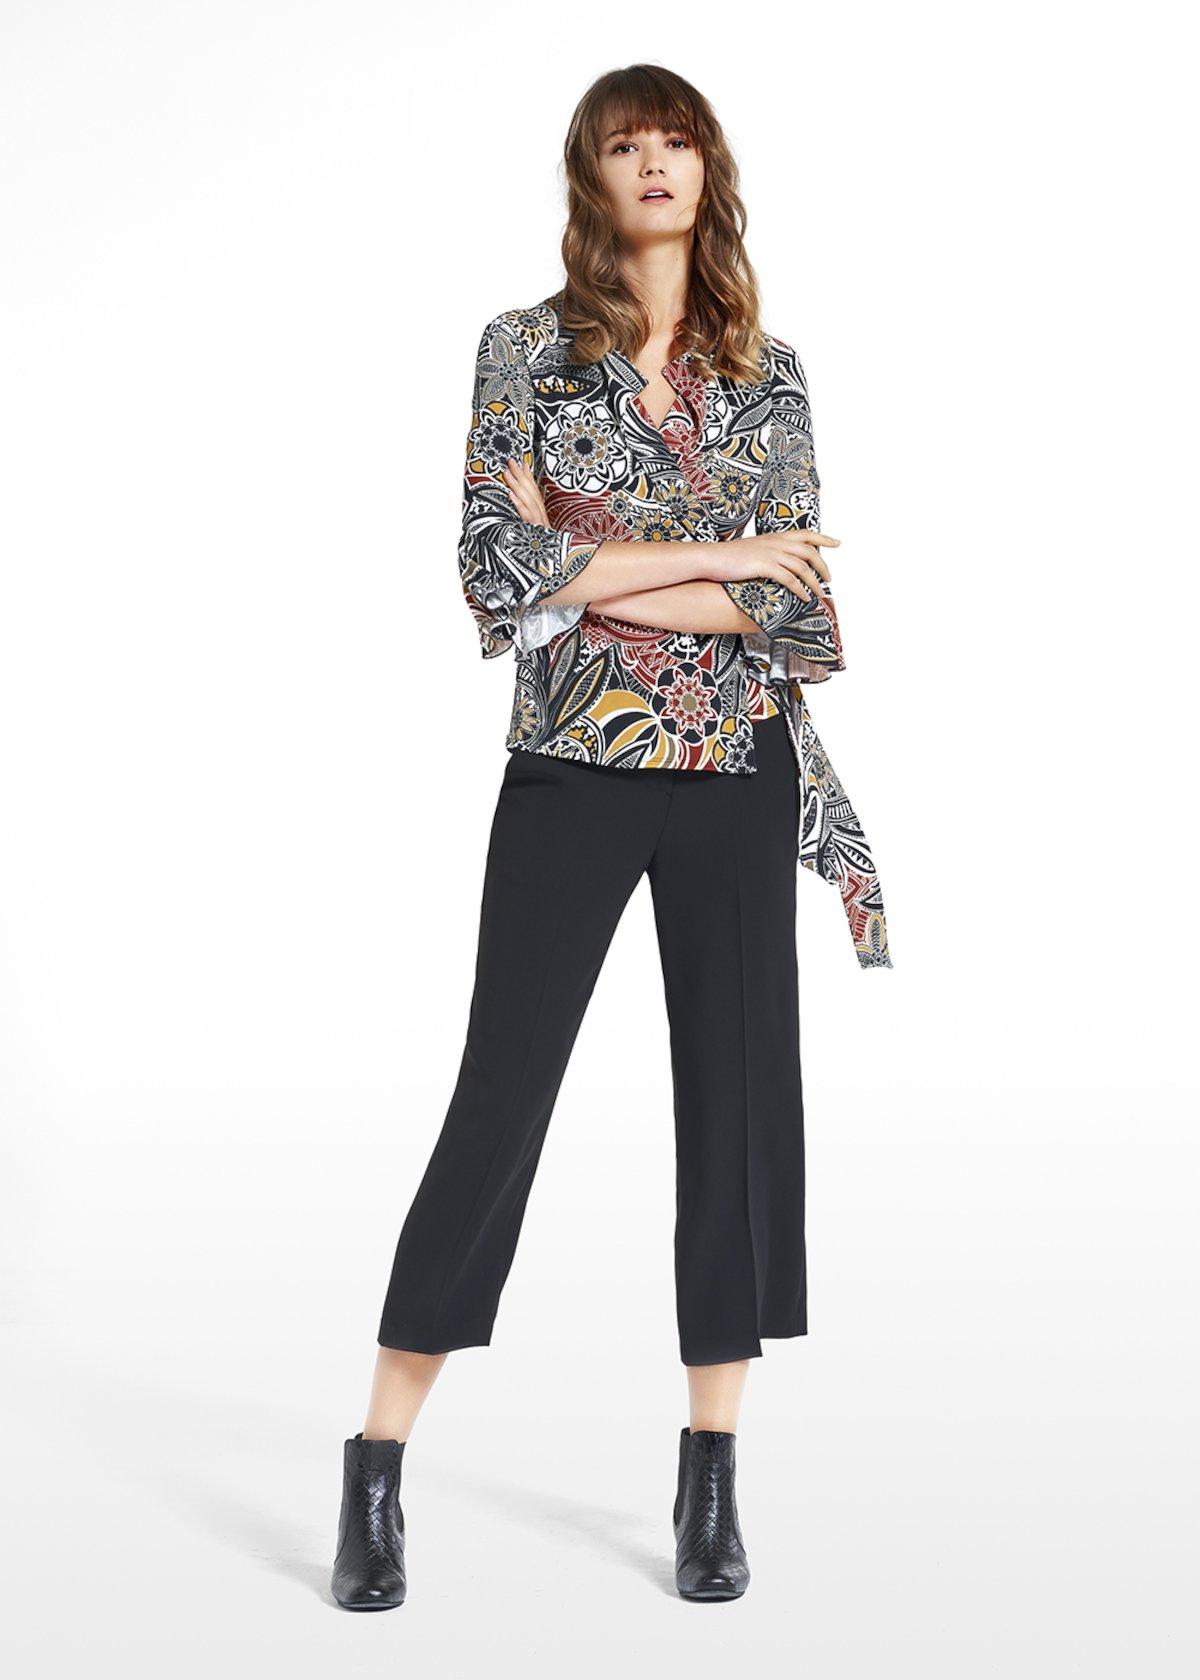 T-shirt Shana patterned desert Gobi - Black White Fantasia - Woman - Category image